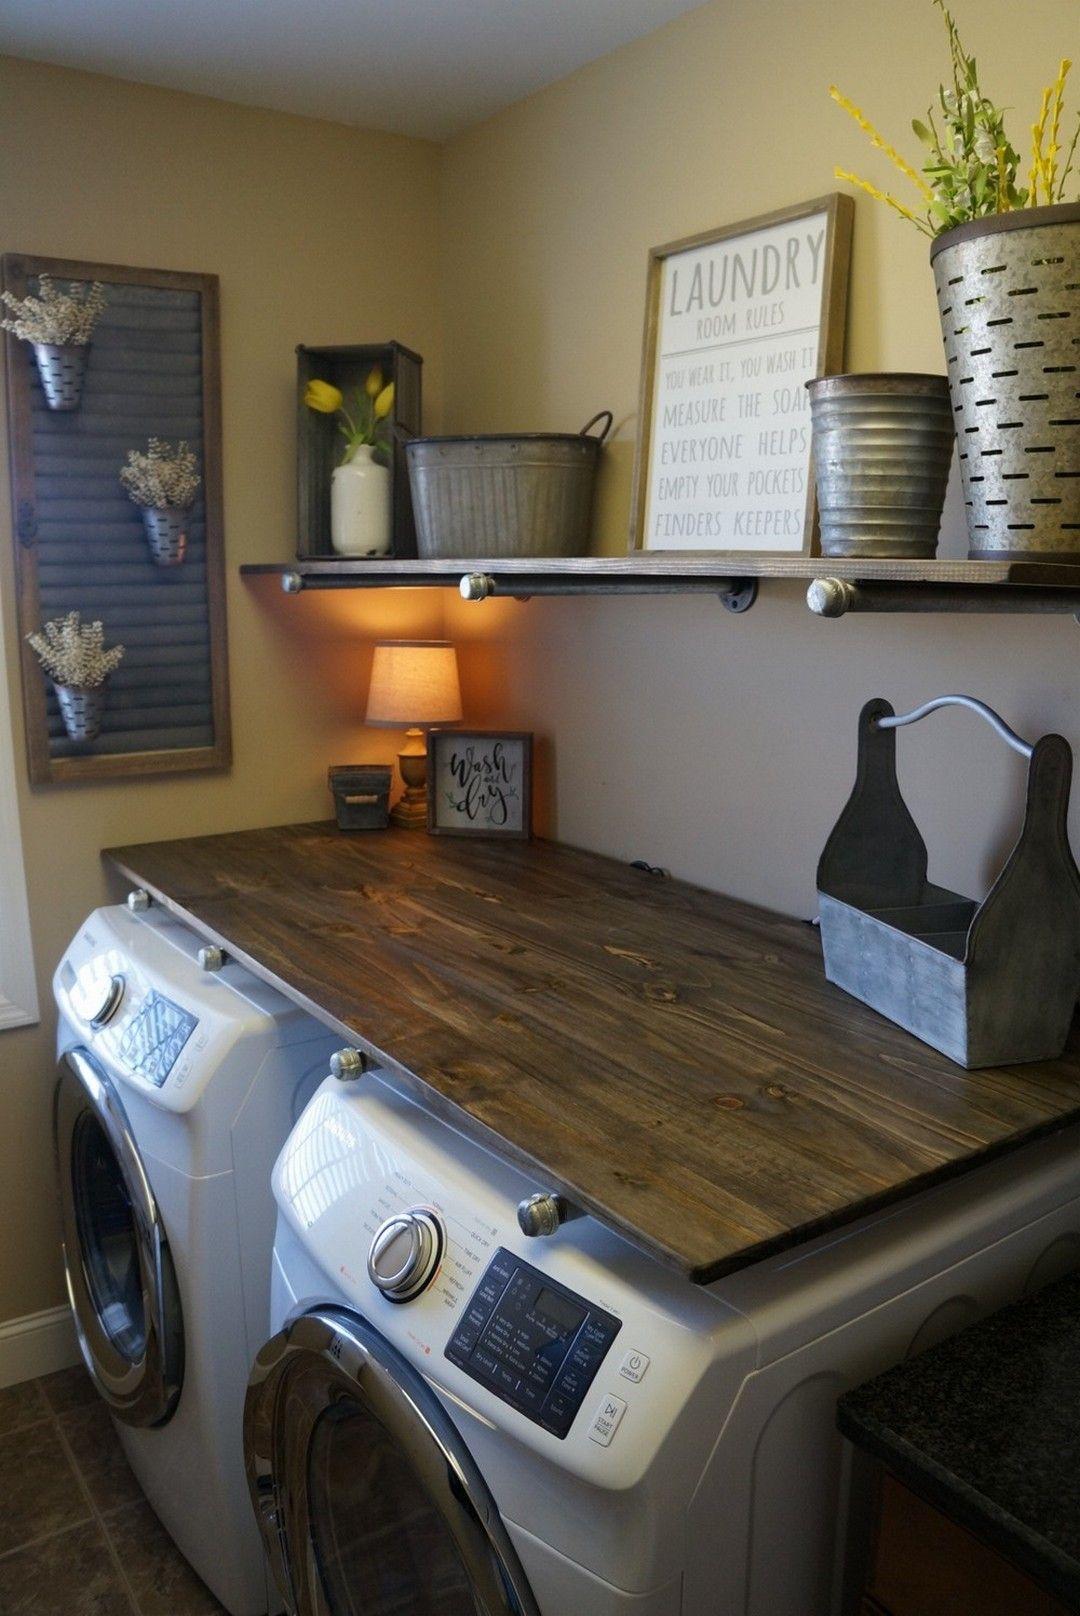 Diy Apartment Decorating Ideas On A Budget 89 Laundry Room Diy